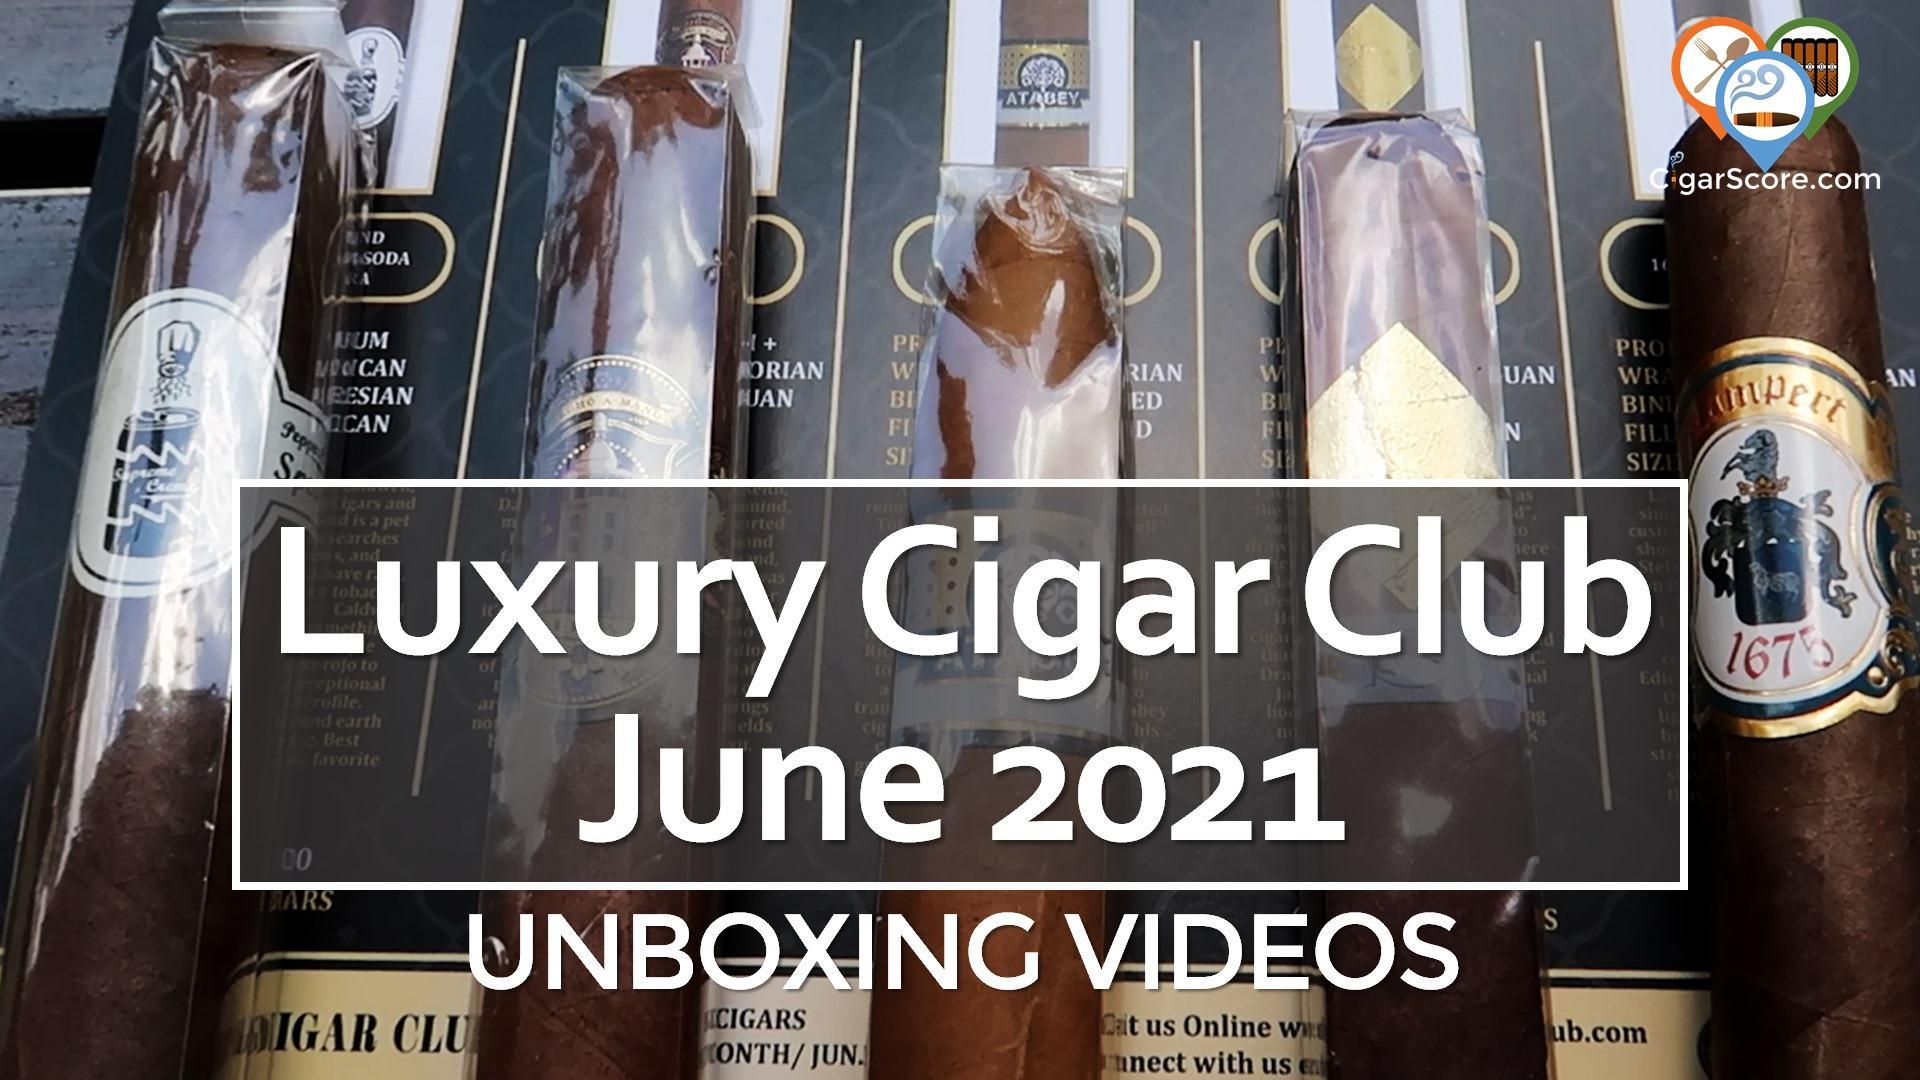 Unboxing - Luxury Cigar Club 2021 June